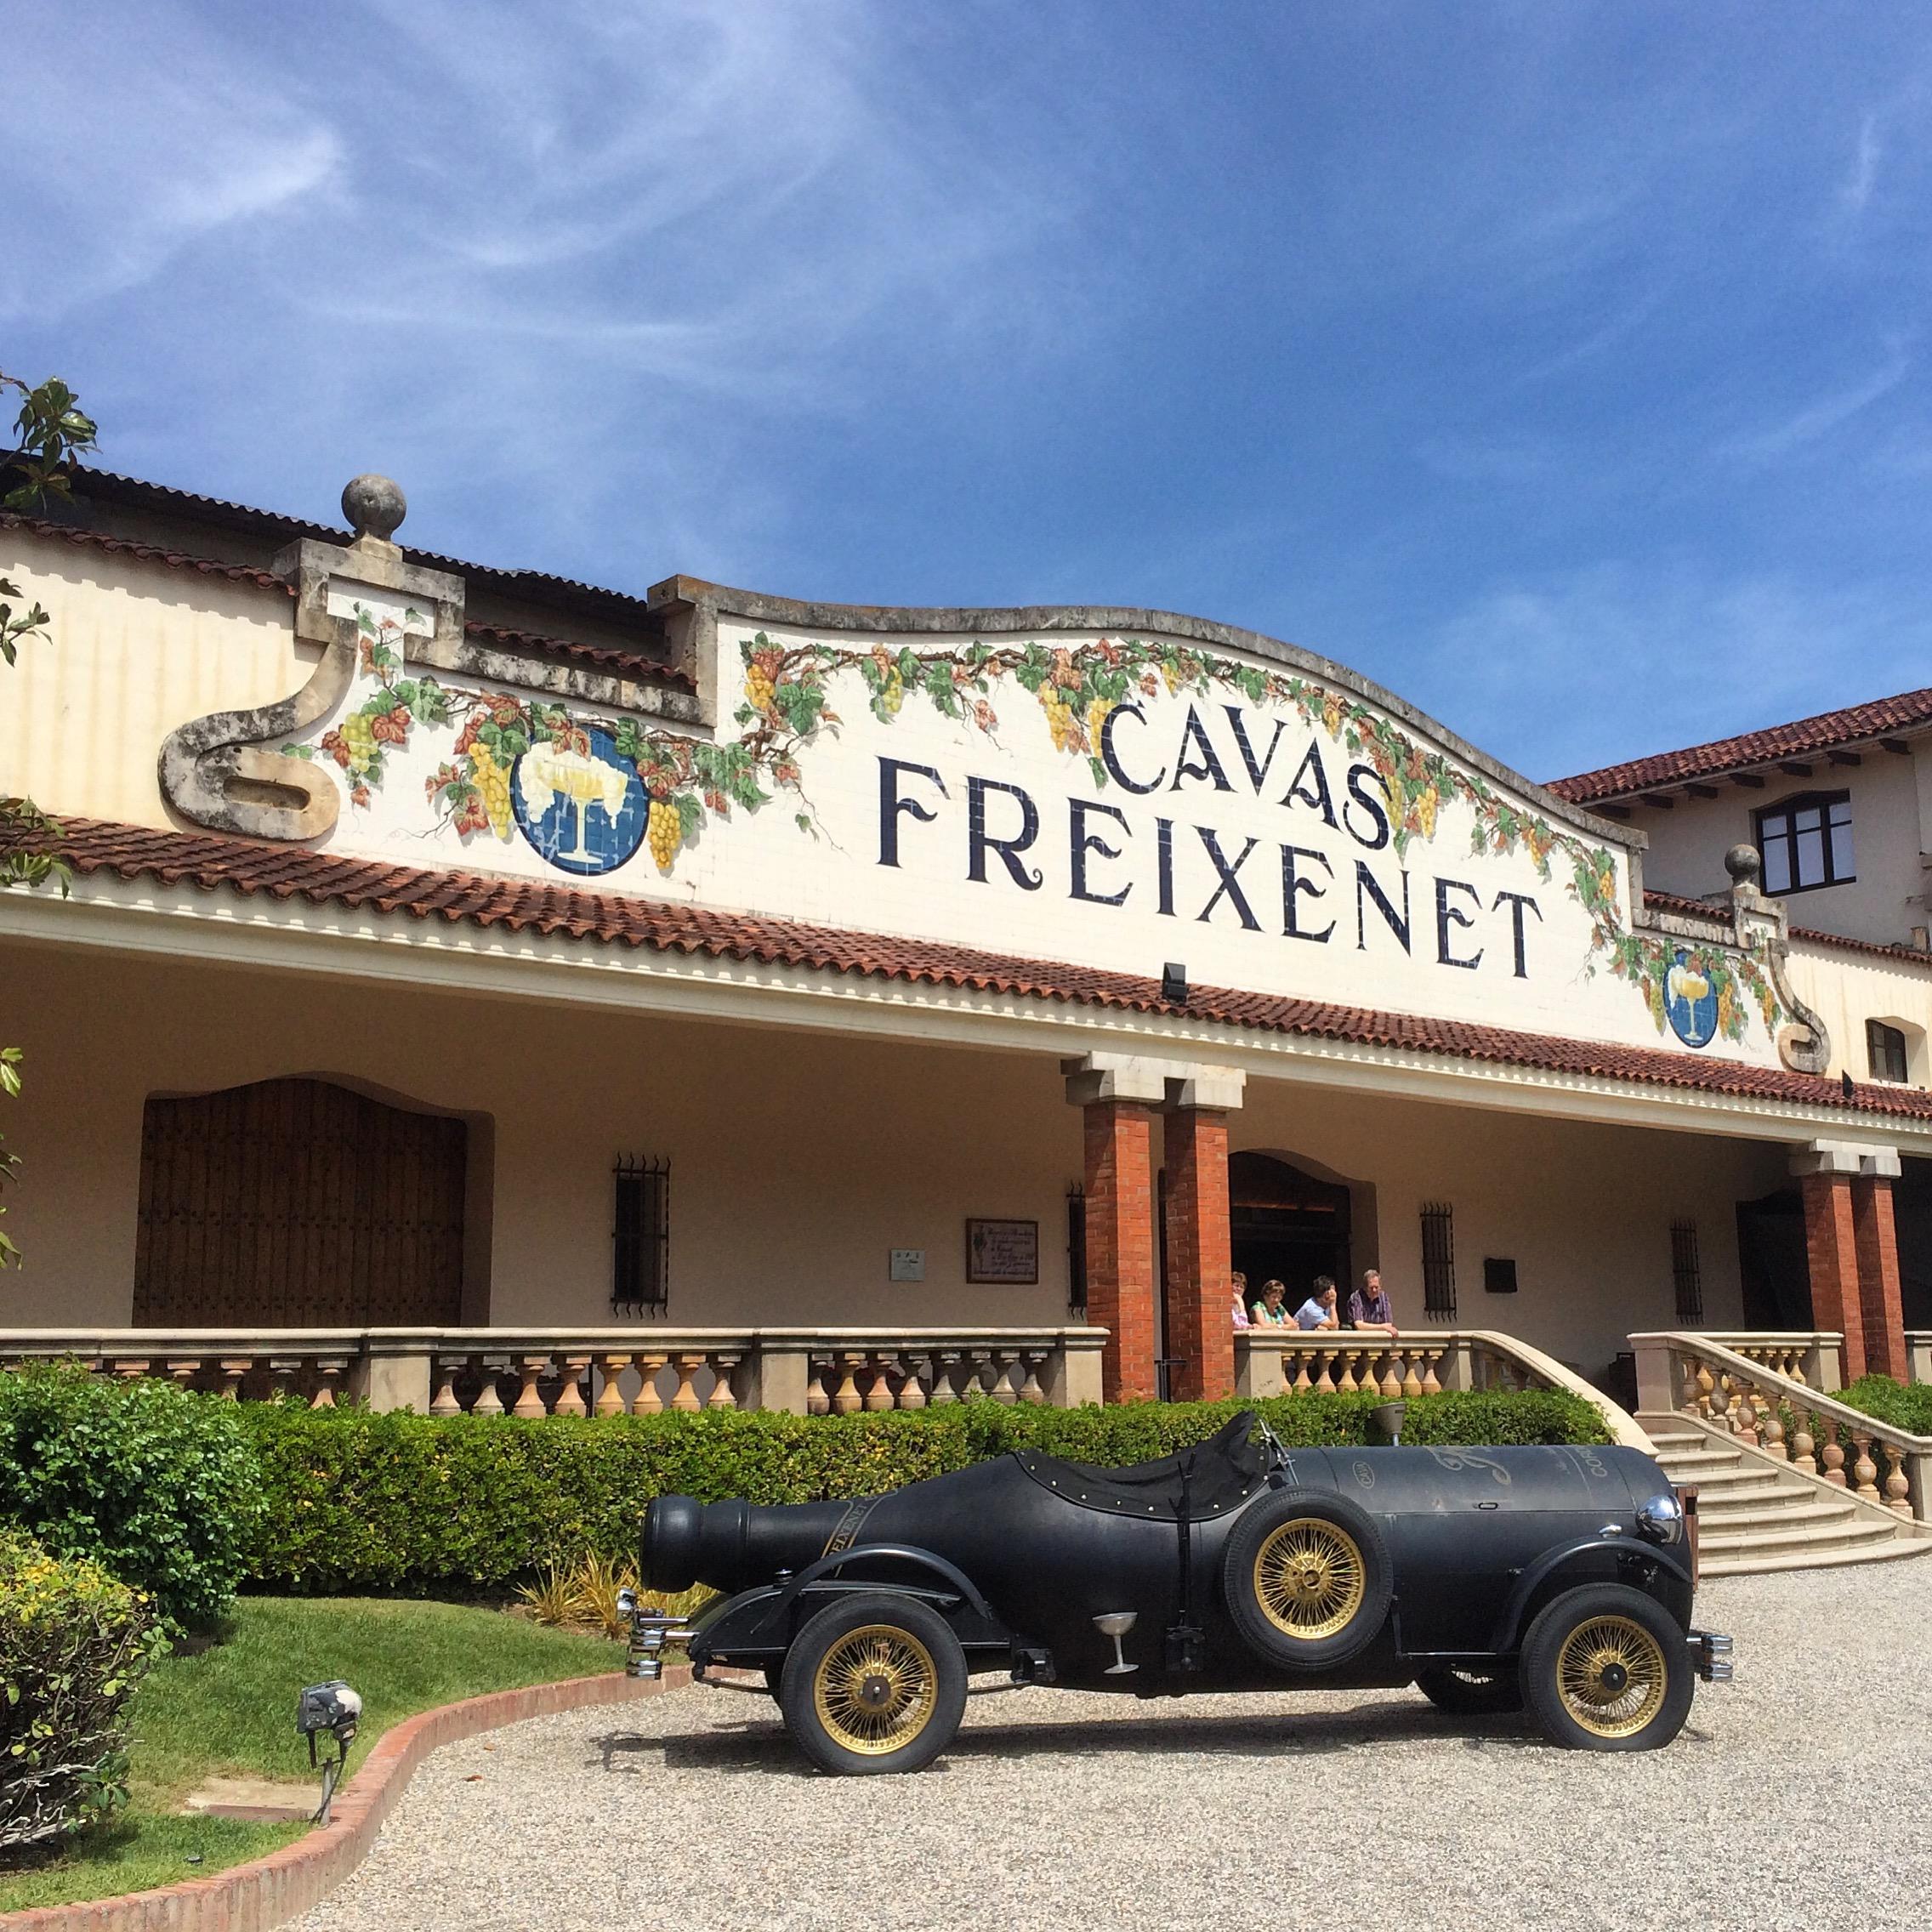 cava freixenet - just outside the sant sadurni train station